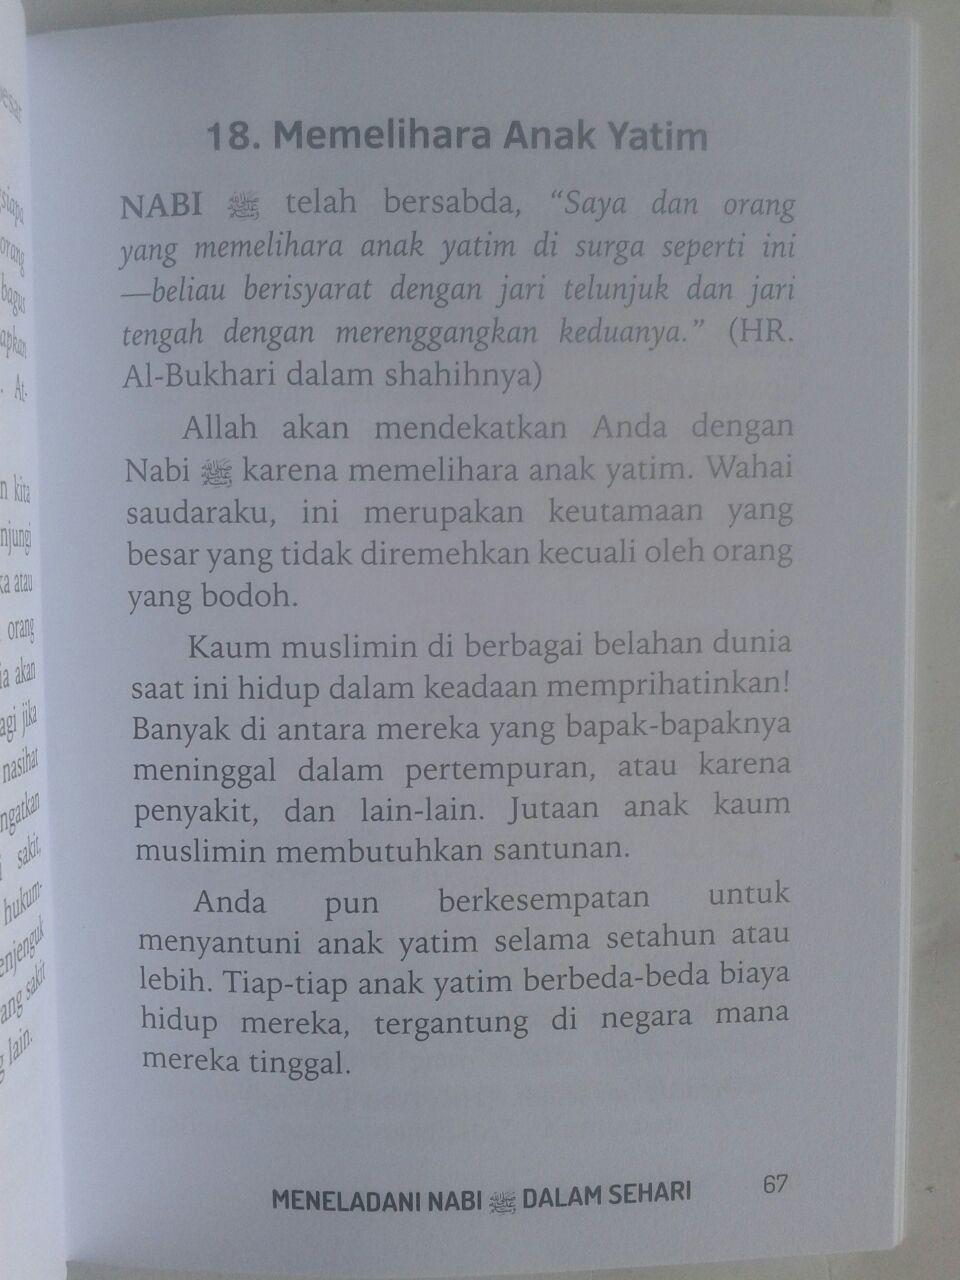 Buku Saku Meneladani Nabi Dalam Sehari isi 2